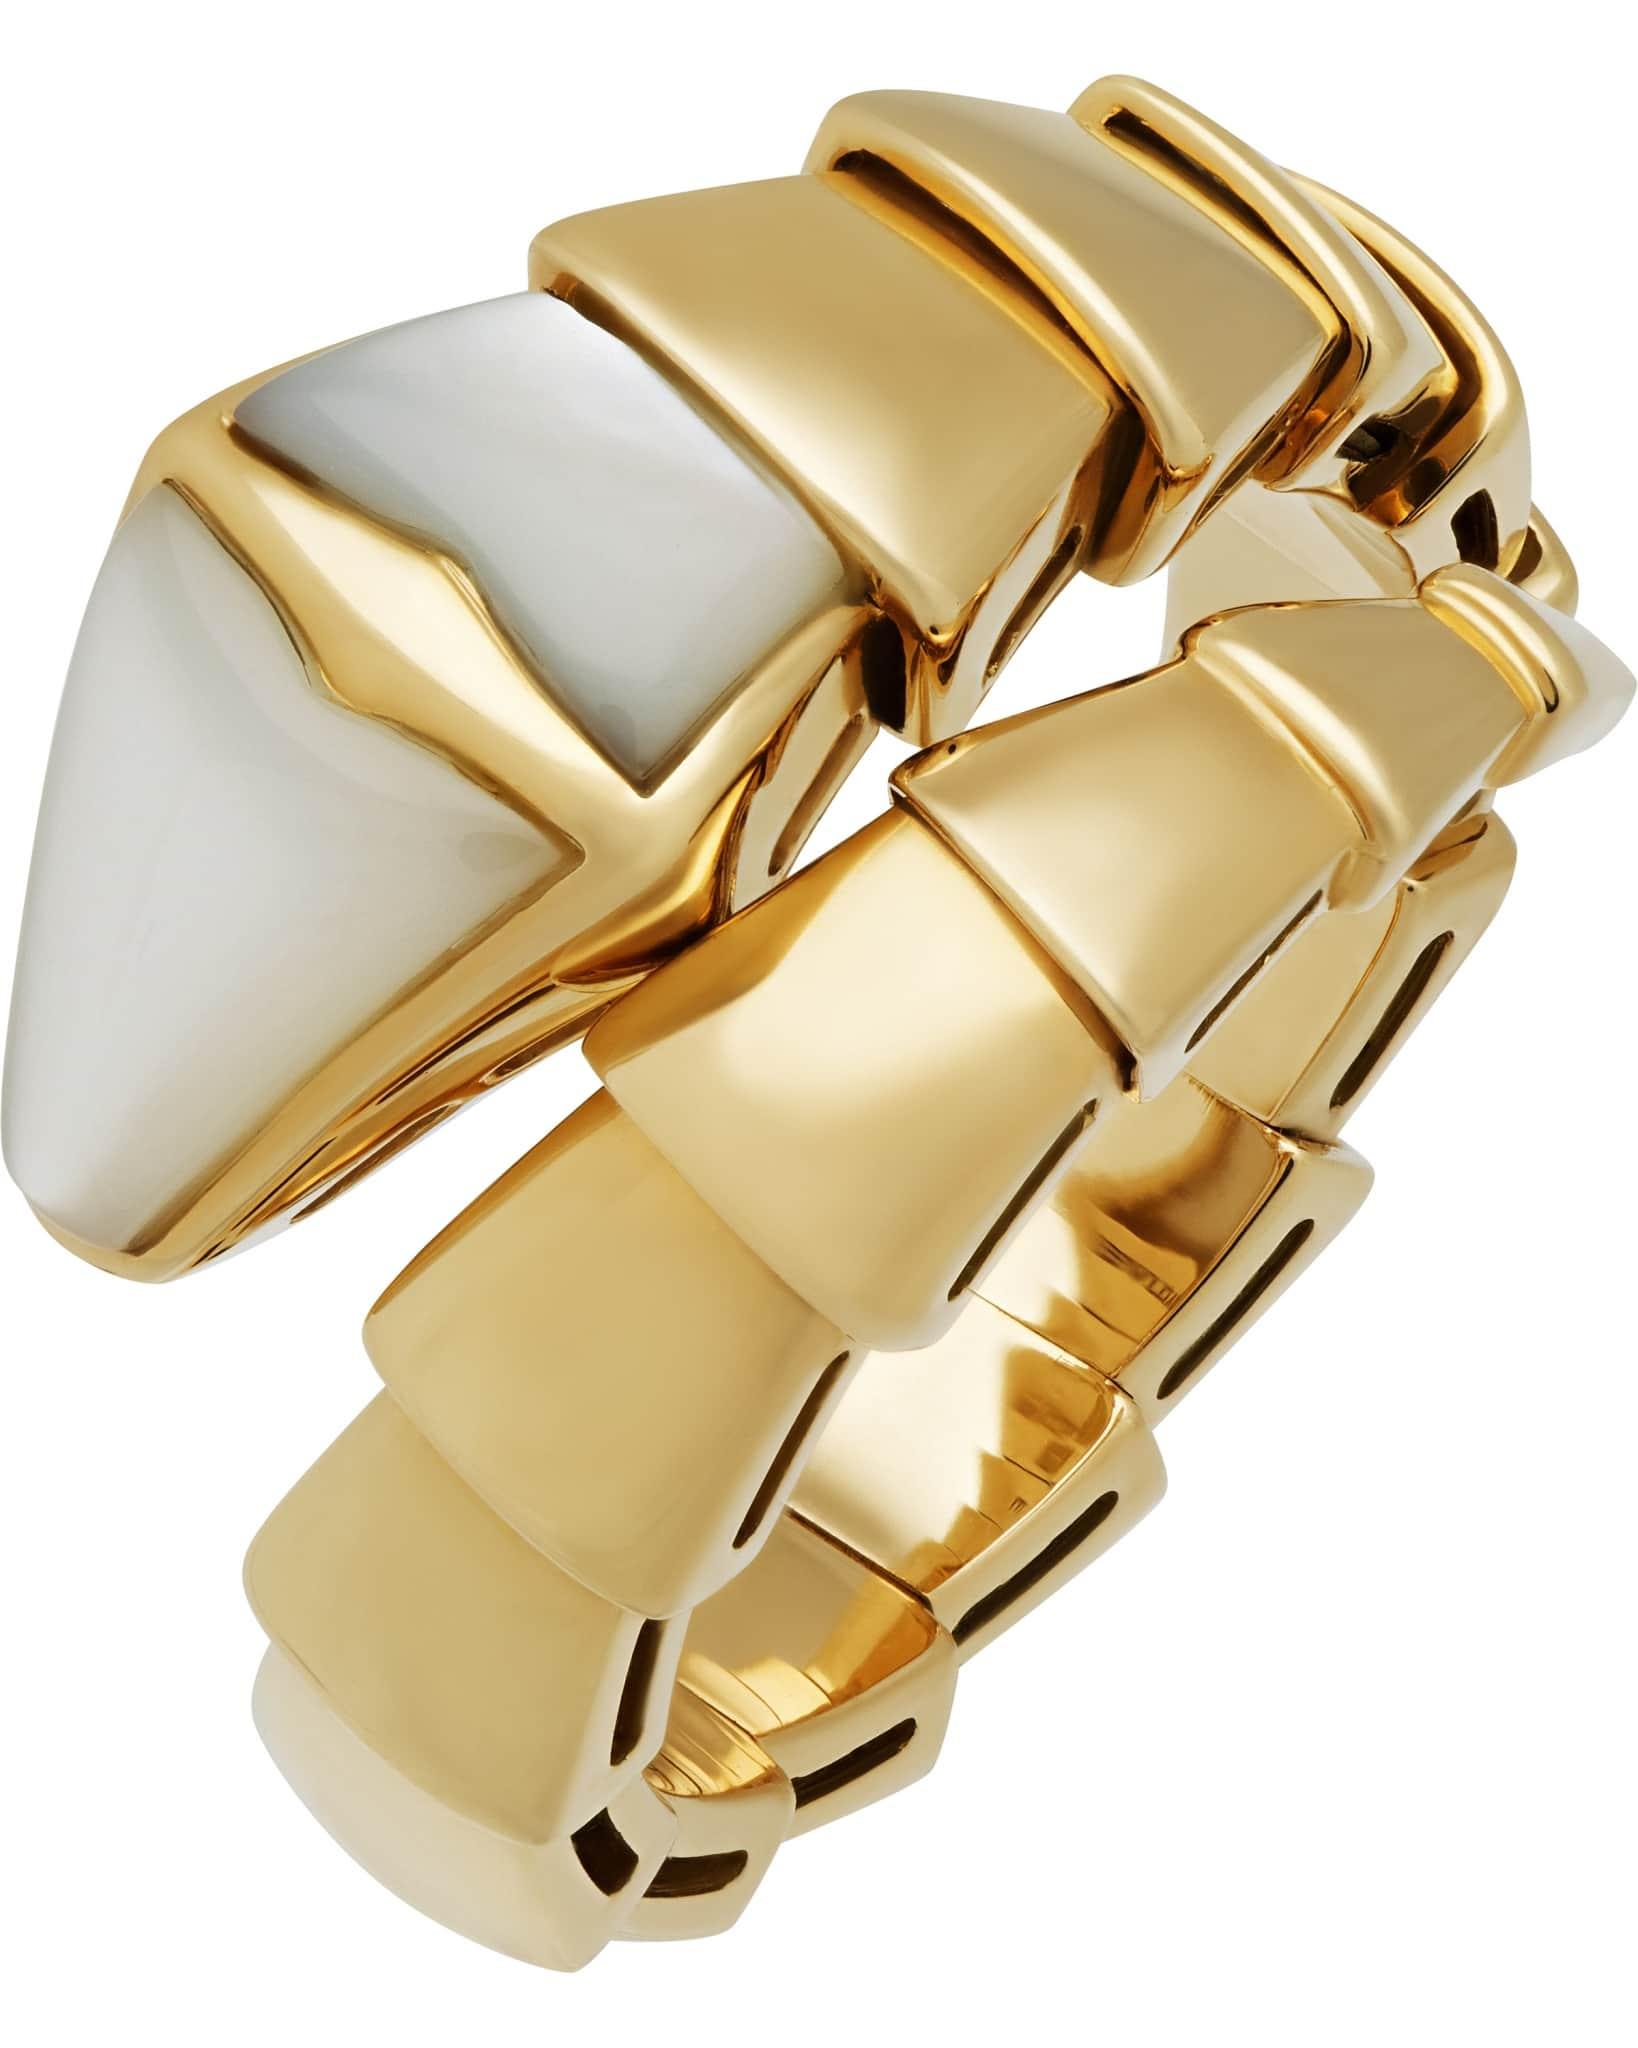 Bvlgari Ring Serpenti 1 Band Yellow Gold Ring – Size 6.5AN855765